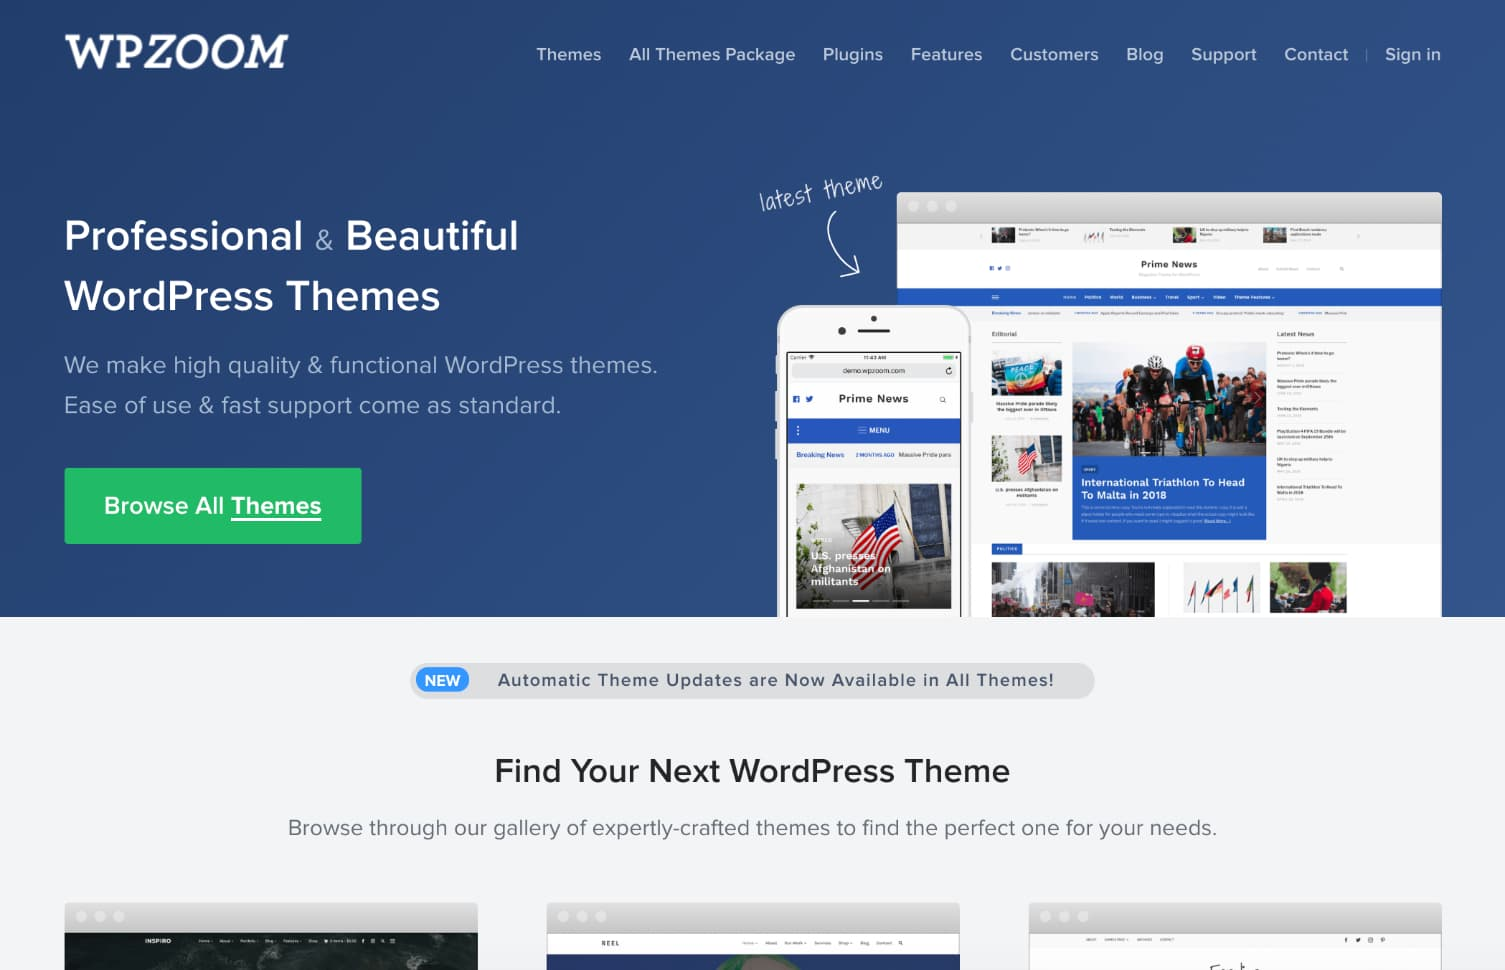 WPZOOM WordPress theme shop